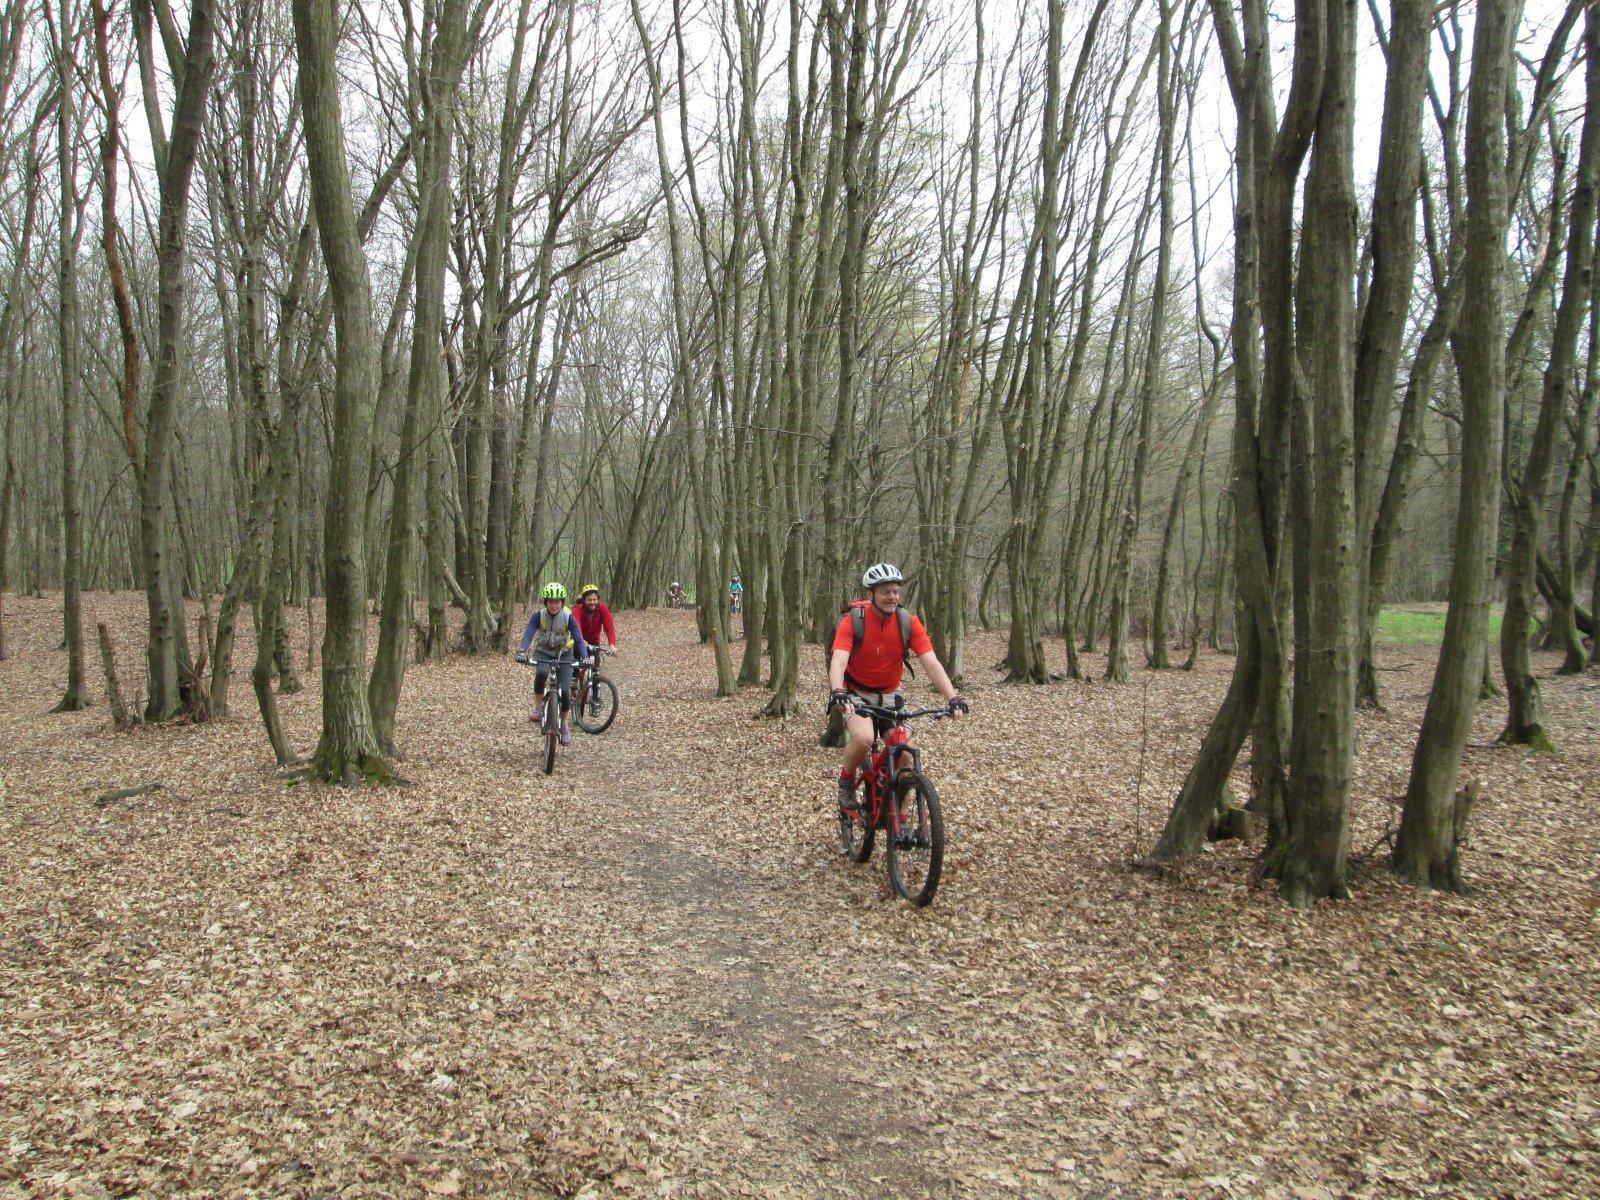 piacevoli sentierini tra i boschi